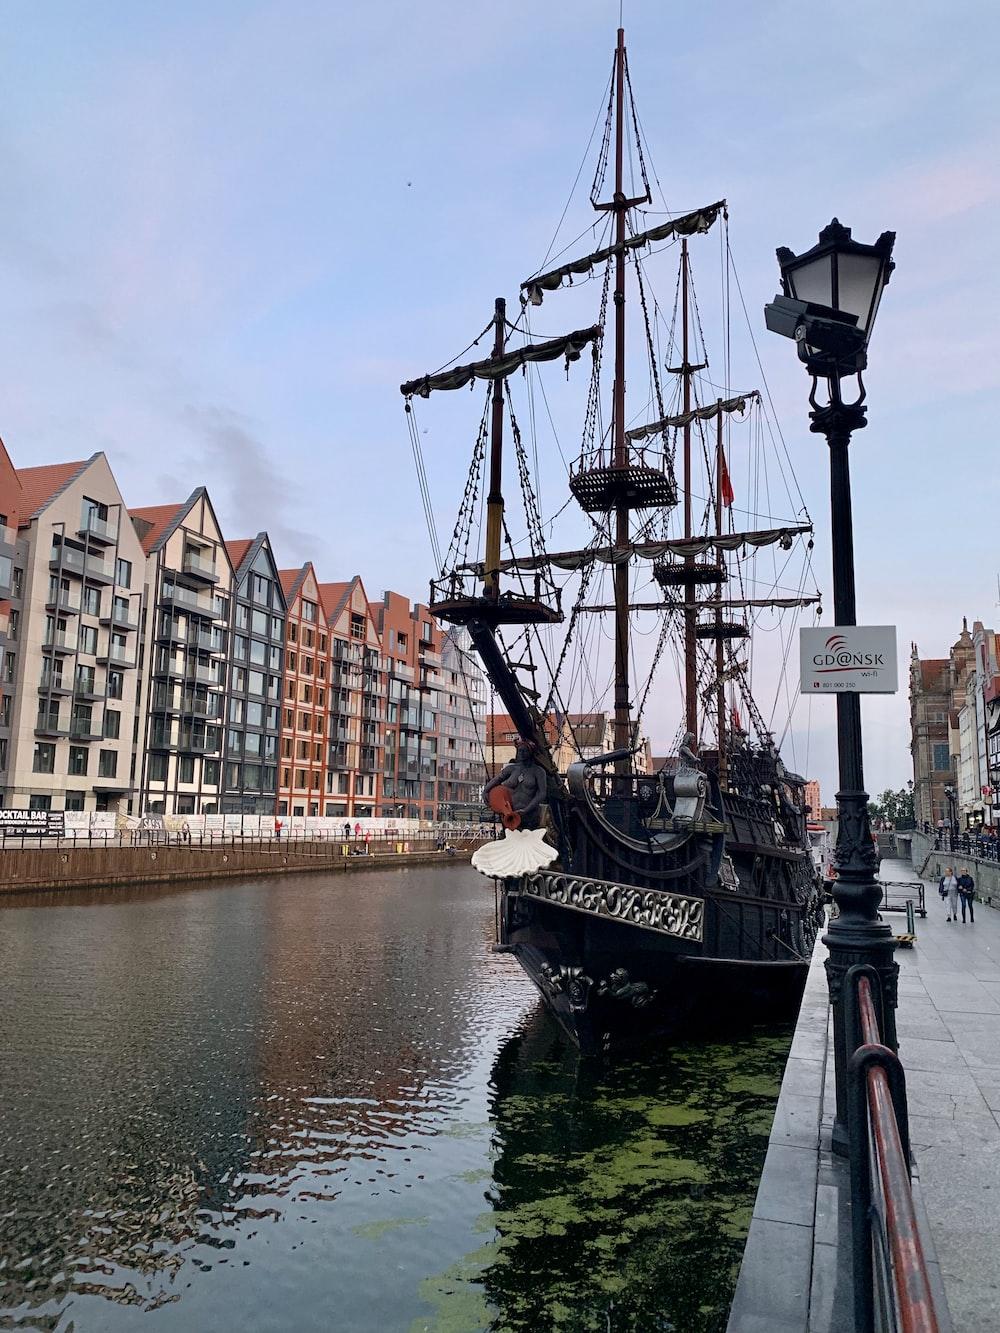 black galleon ship docked near houses during daytime